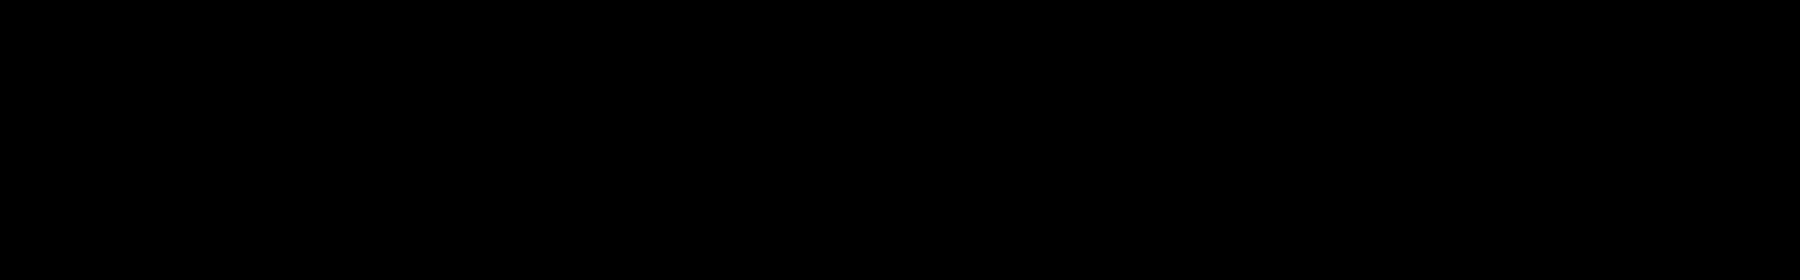 Moksha - Psytrance audio waveform